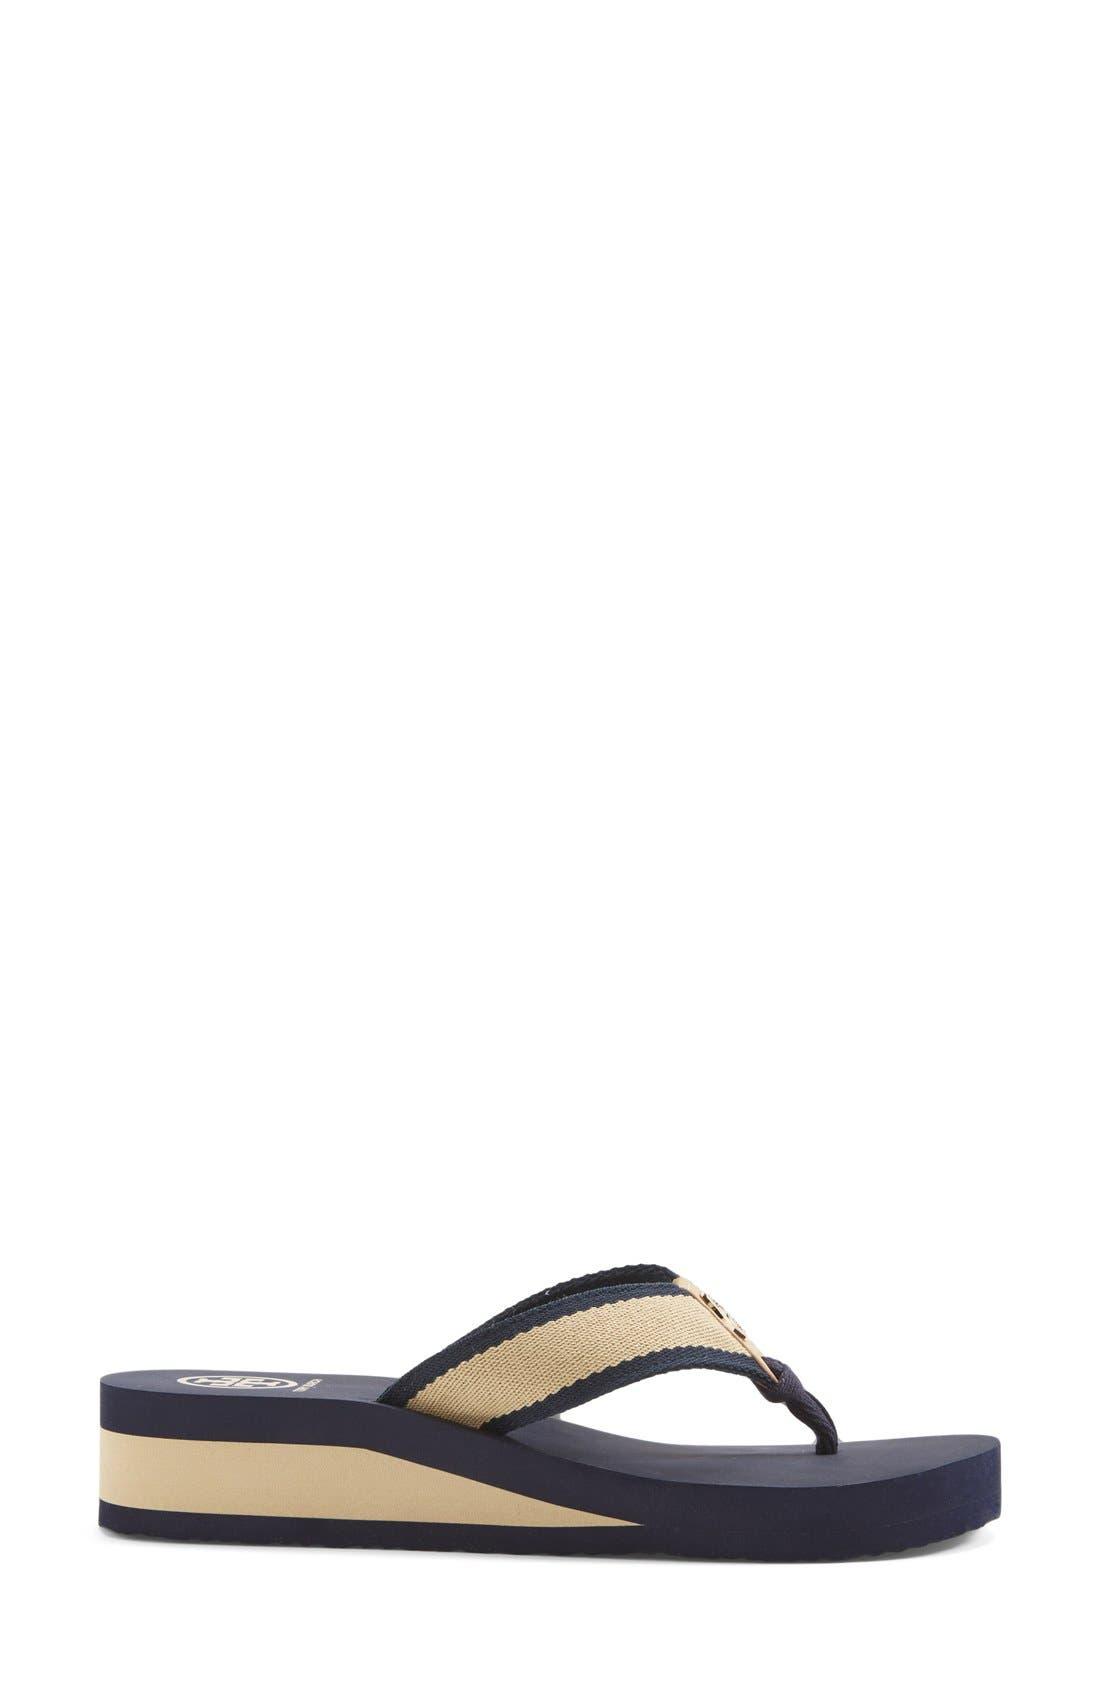 Alternate Image 5  - Tory Burch 'Frankie' Wedge Sandal (Women) (Nordstrom Exclusive)